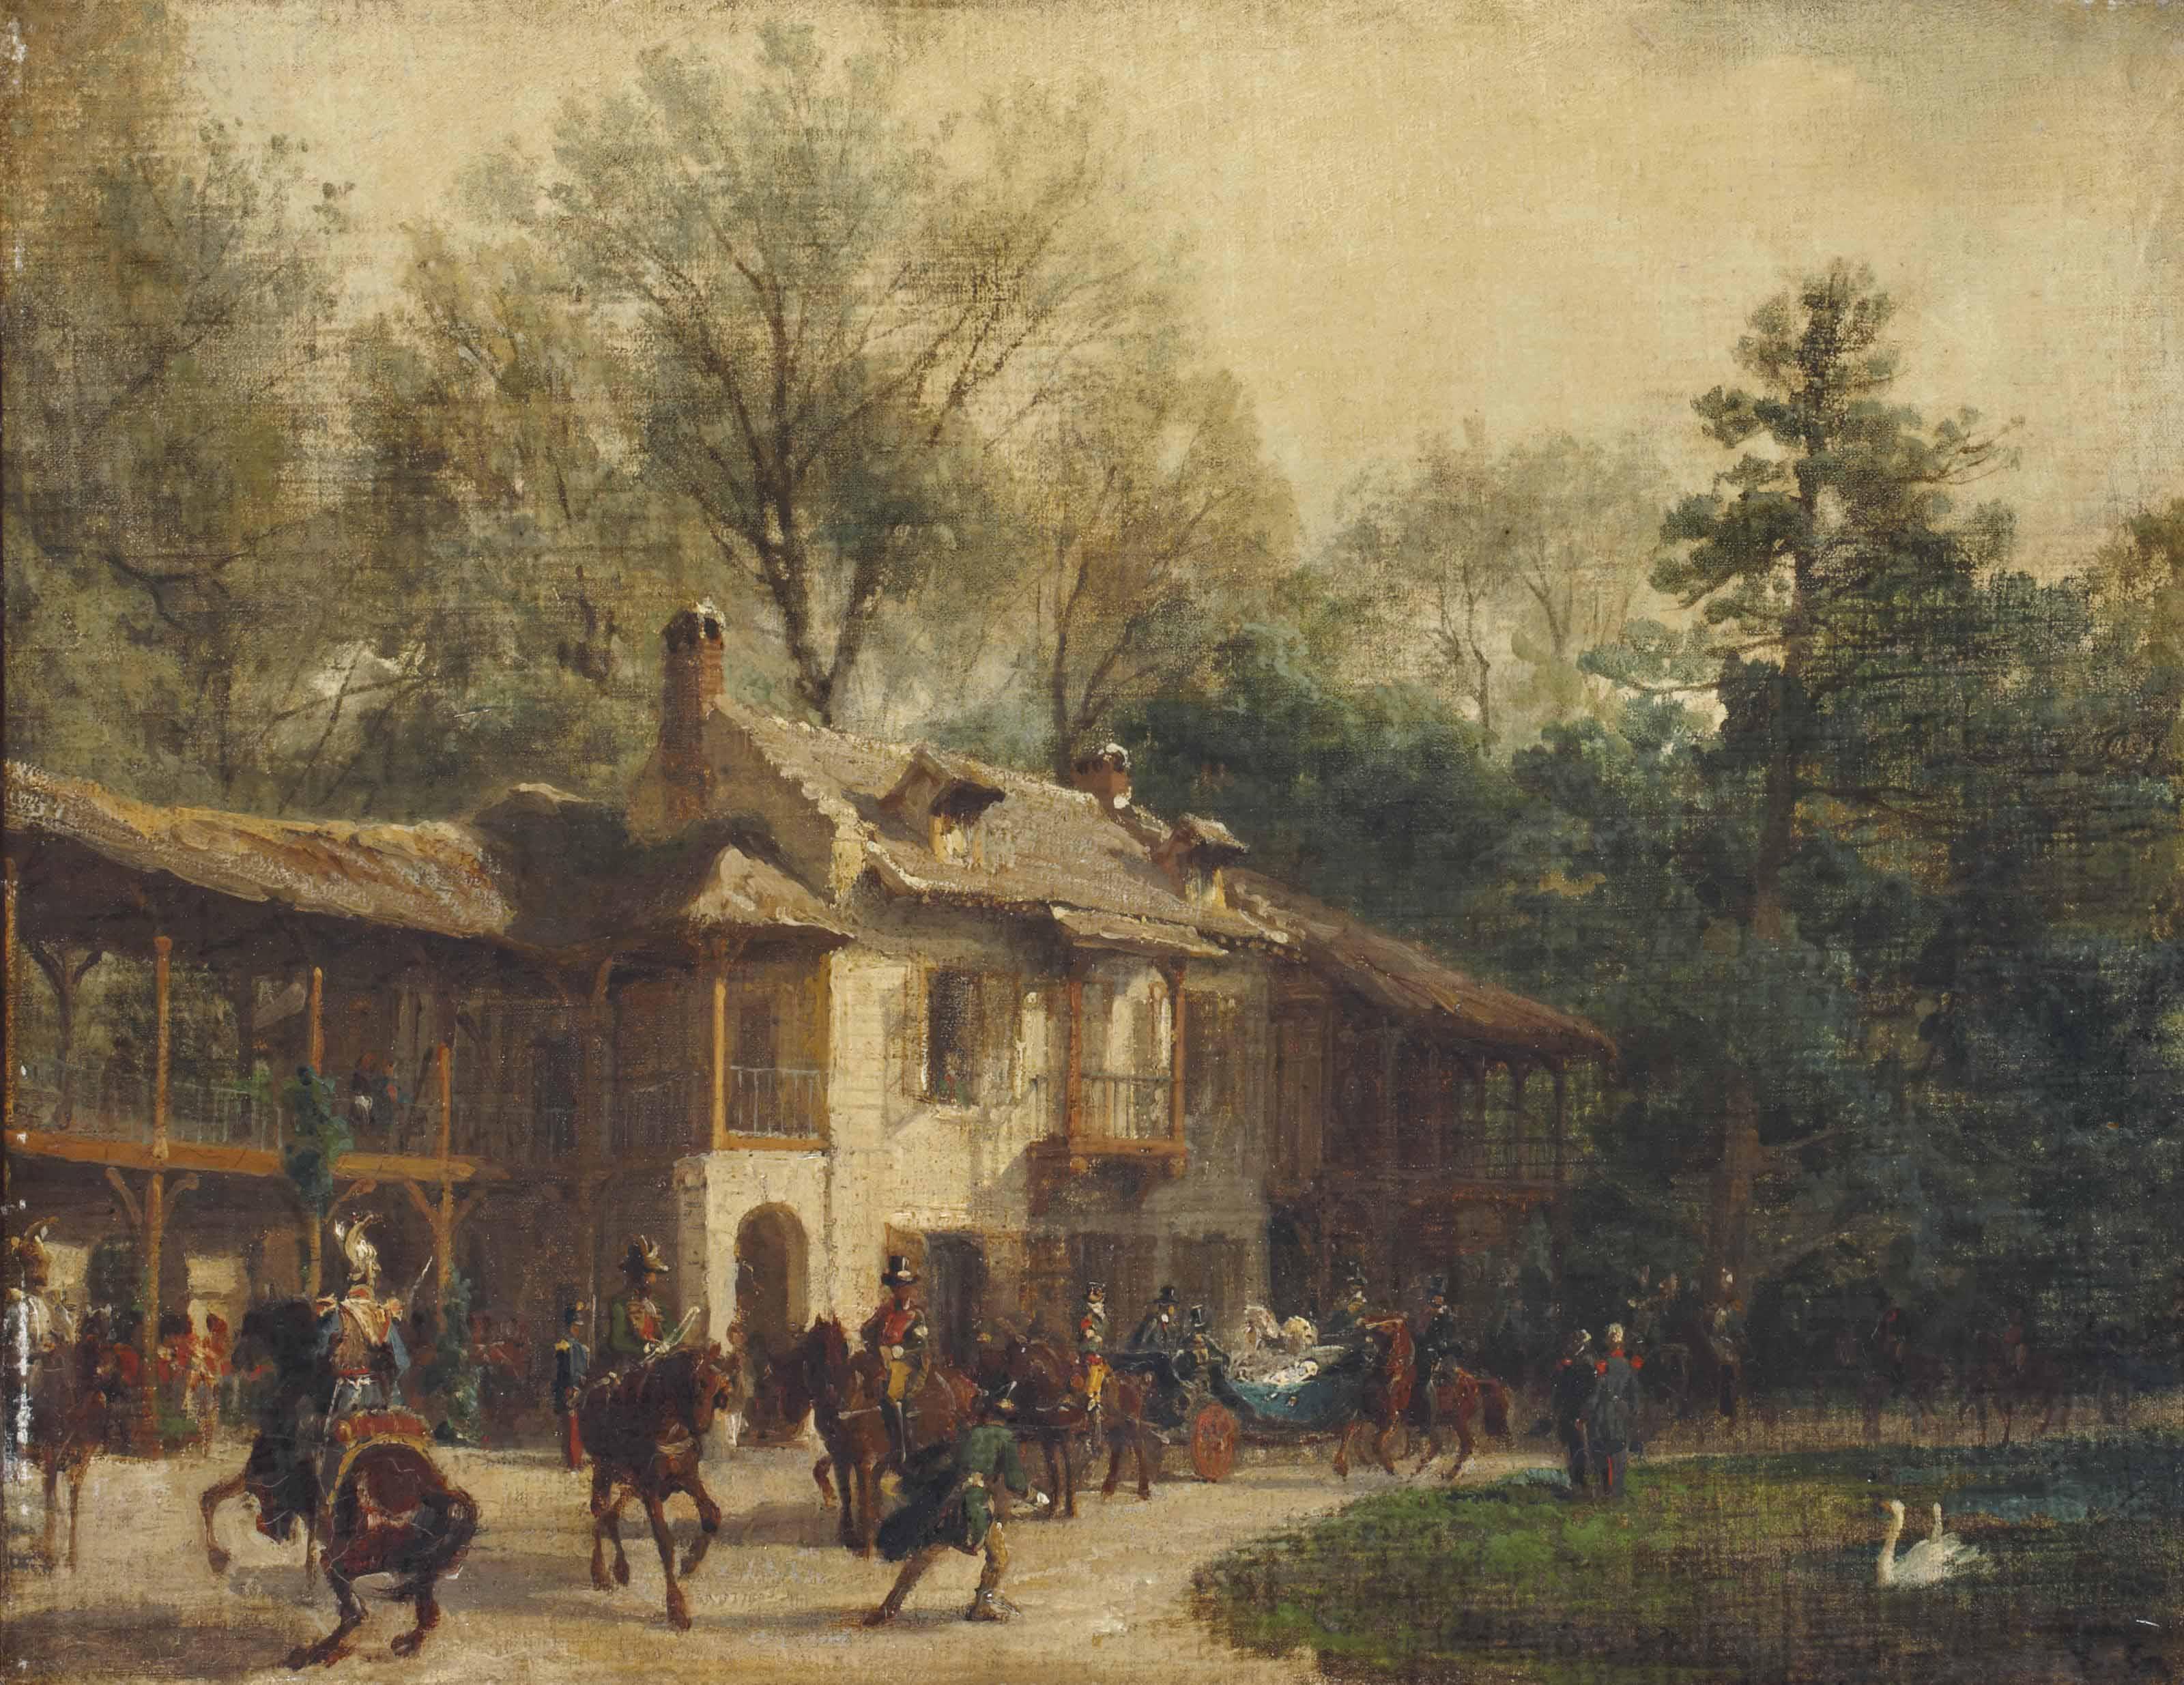 L'impératrice Eugénie au 'Petit hameau' de Trianon